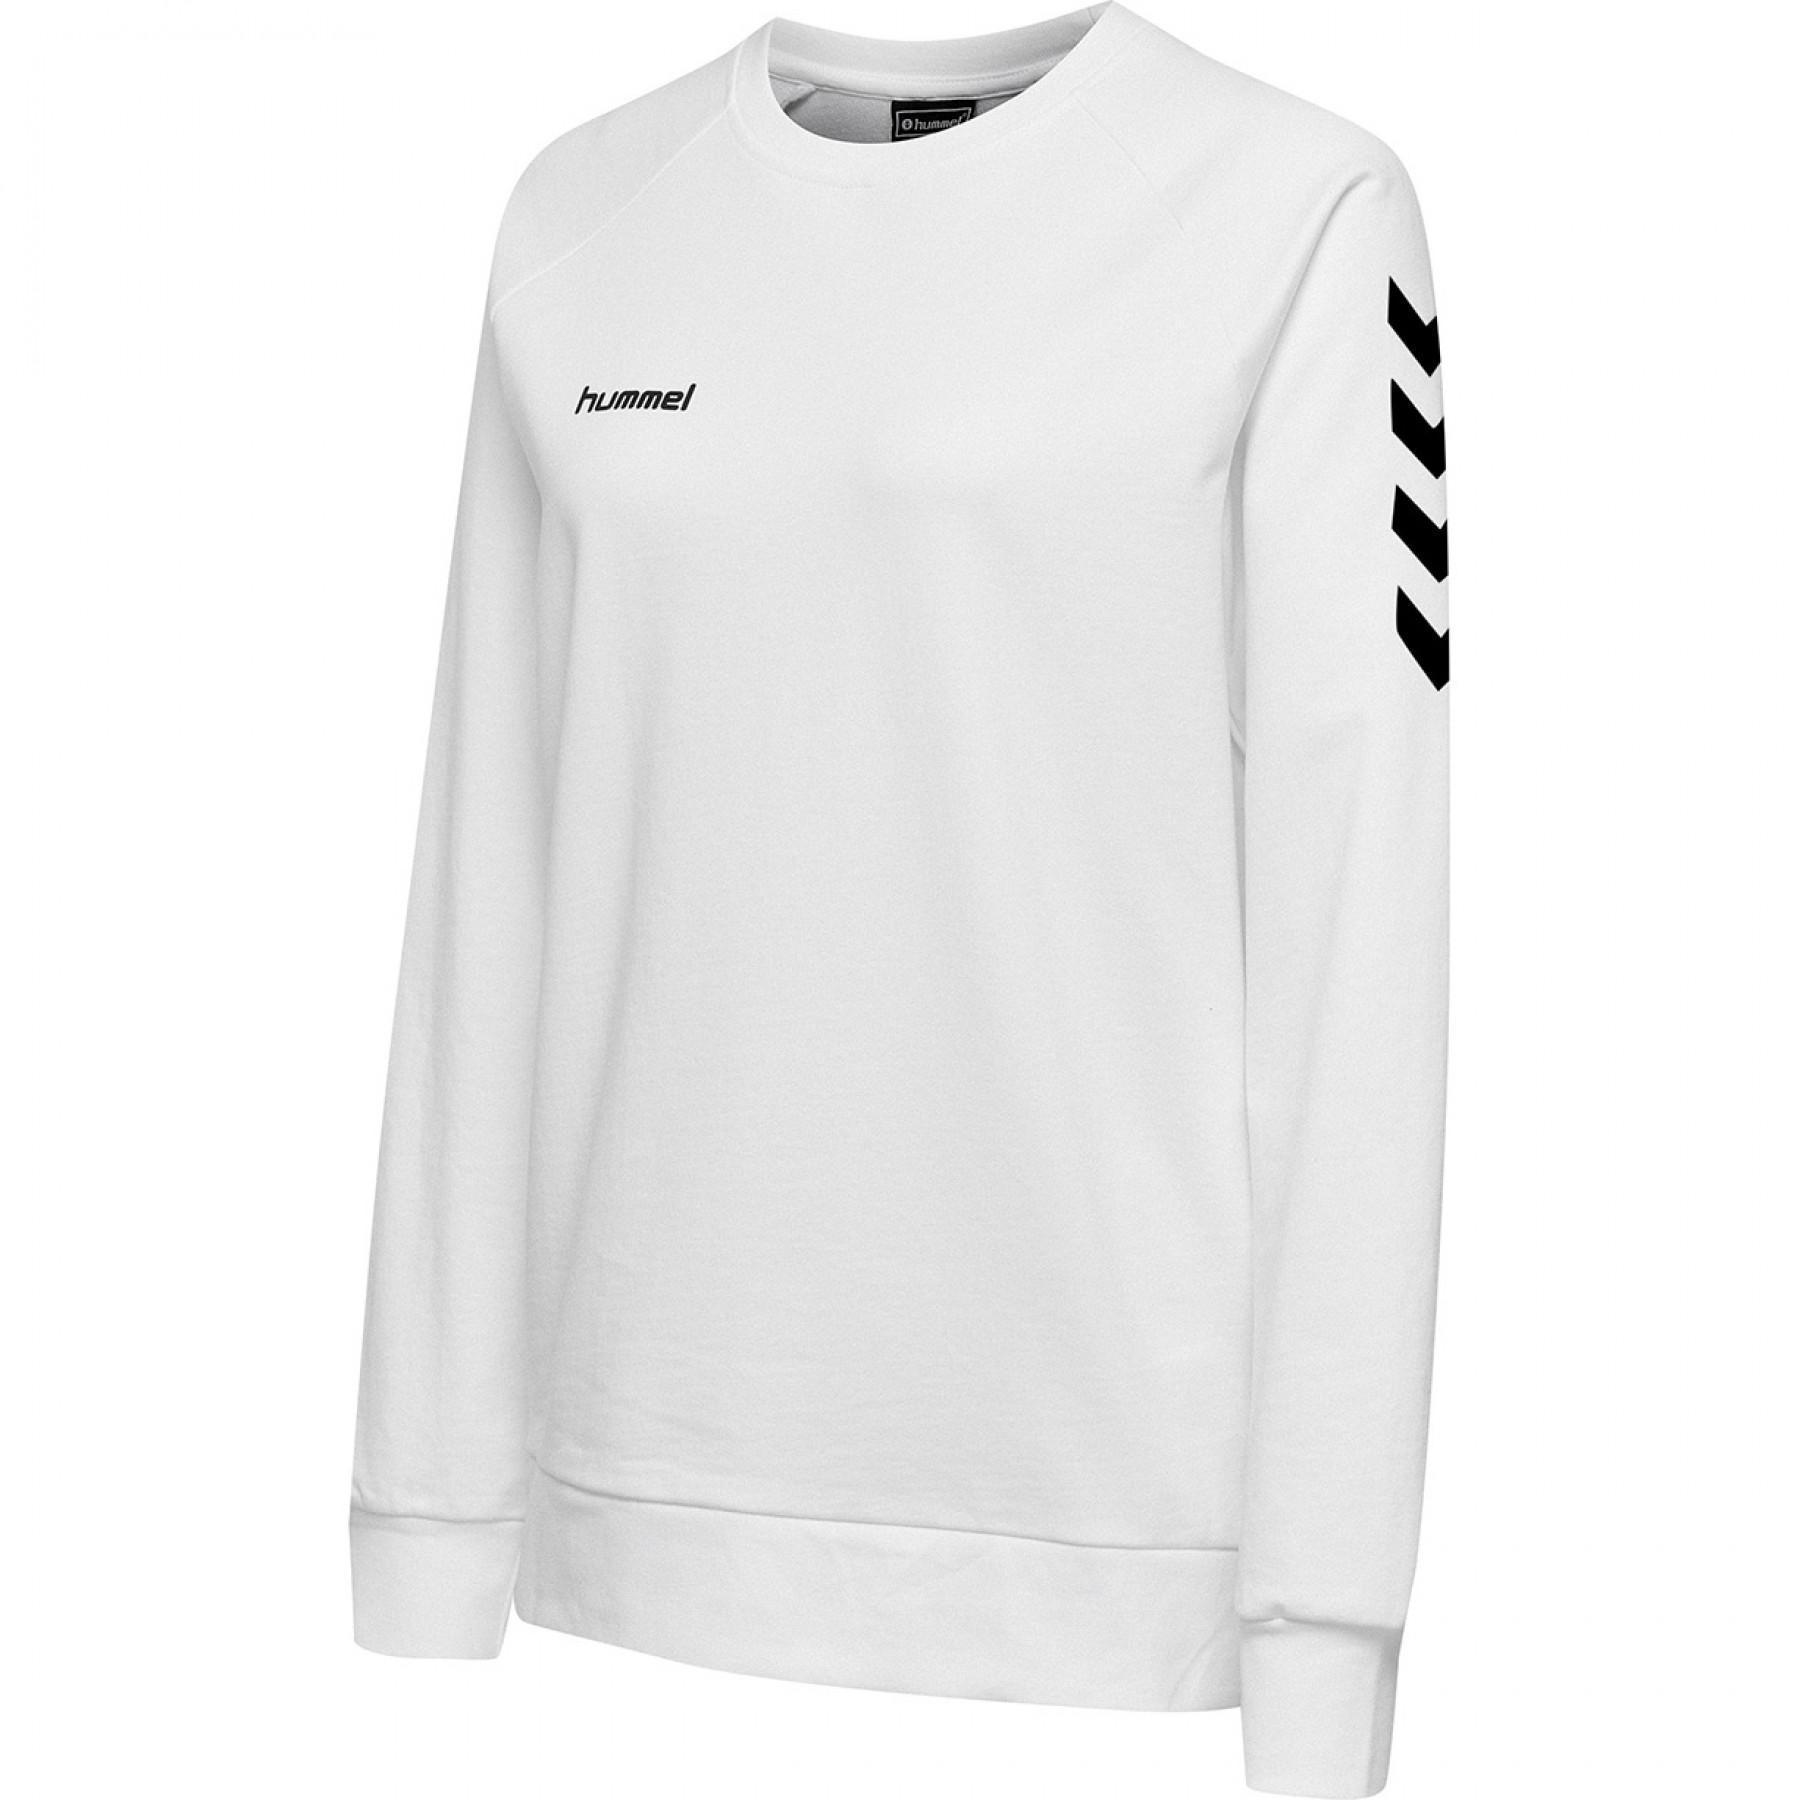 Sweatshirt woman Hummel hmlGO cotton